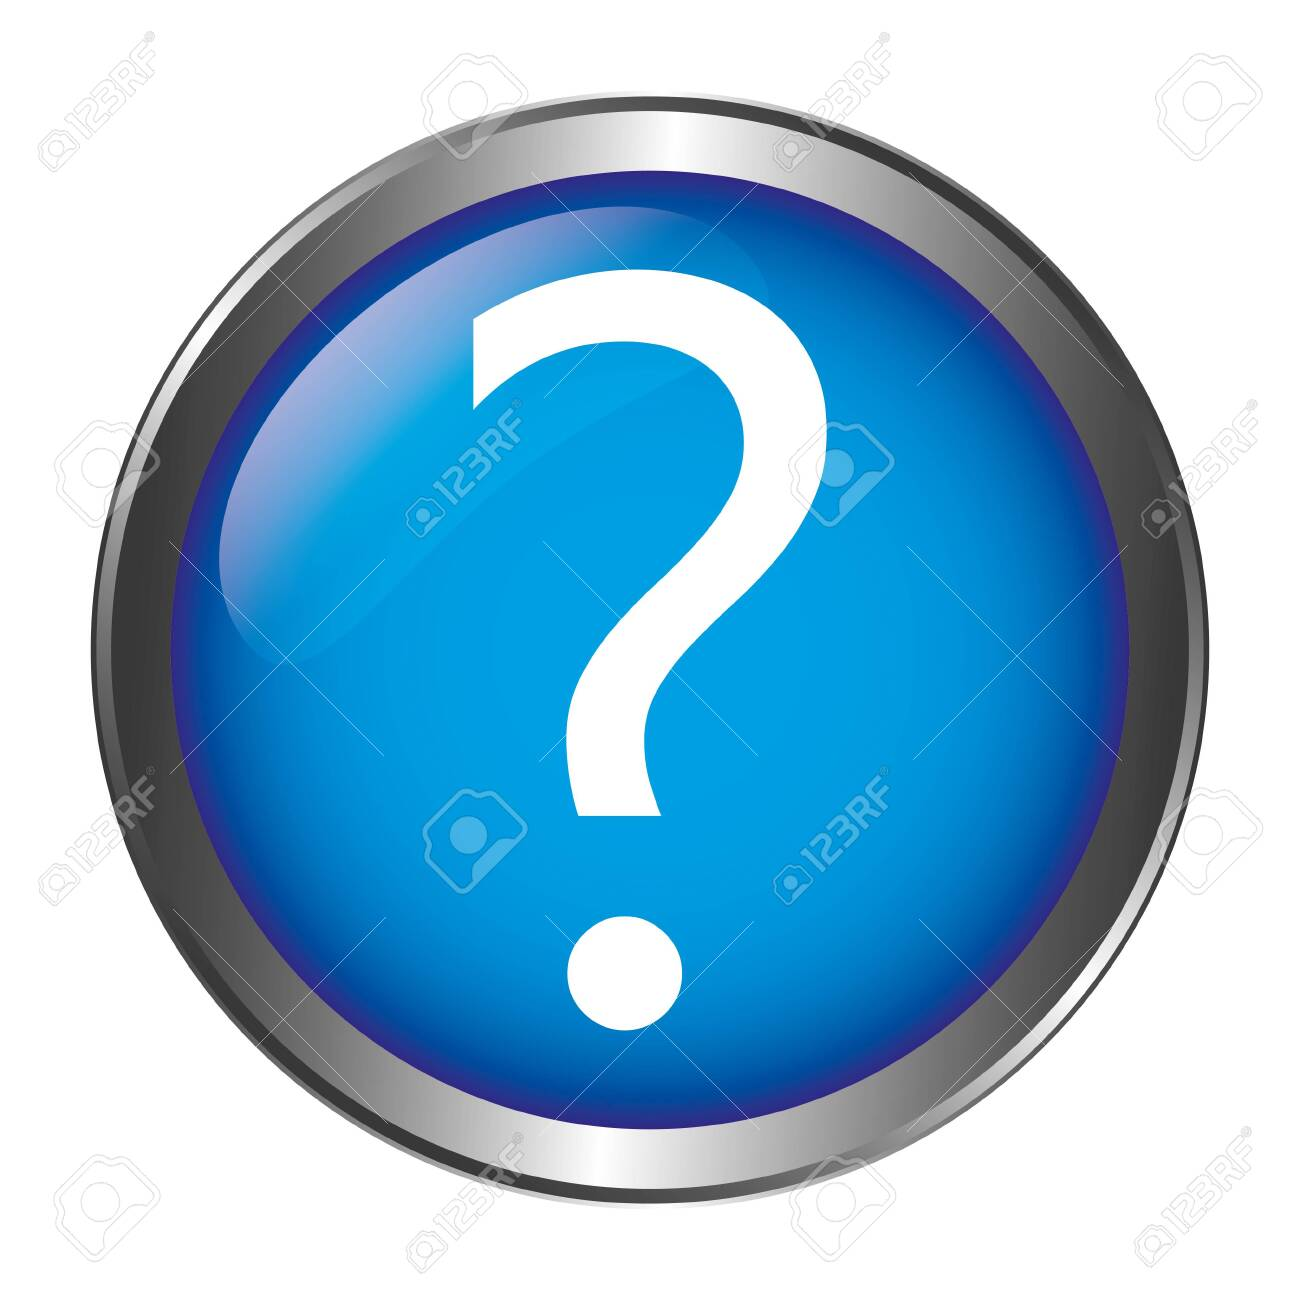 Question Mark Button - 129468959